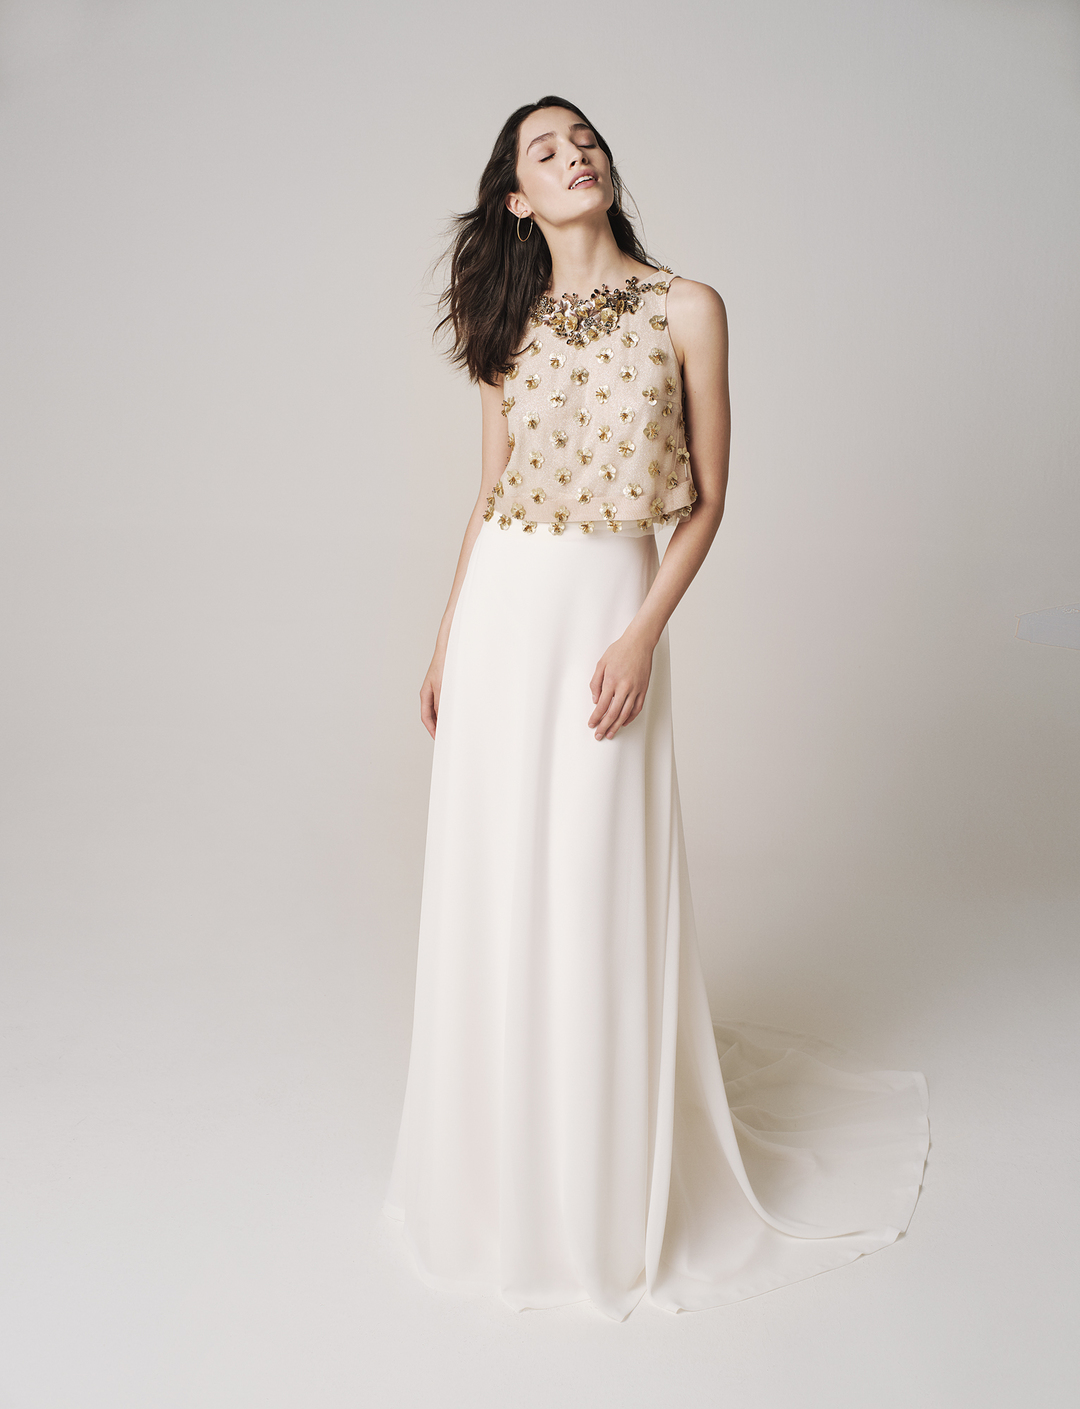 248 dress photo